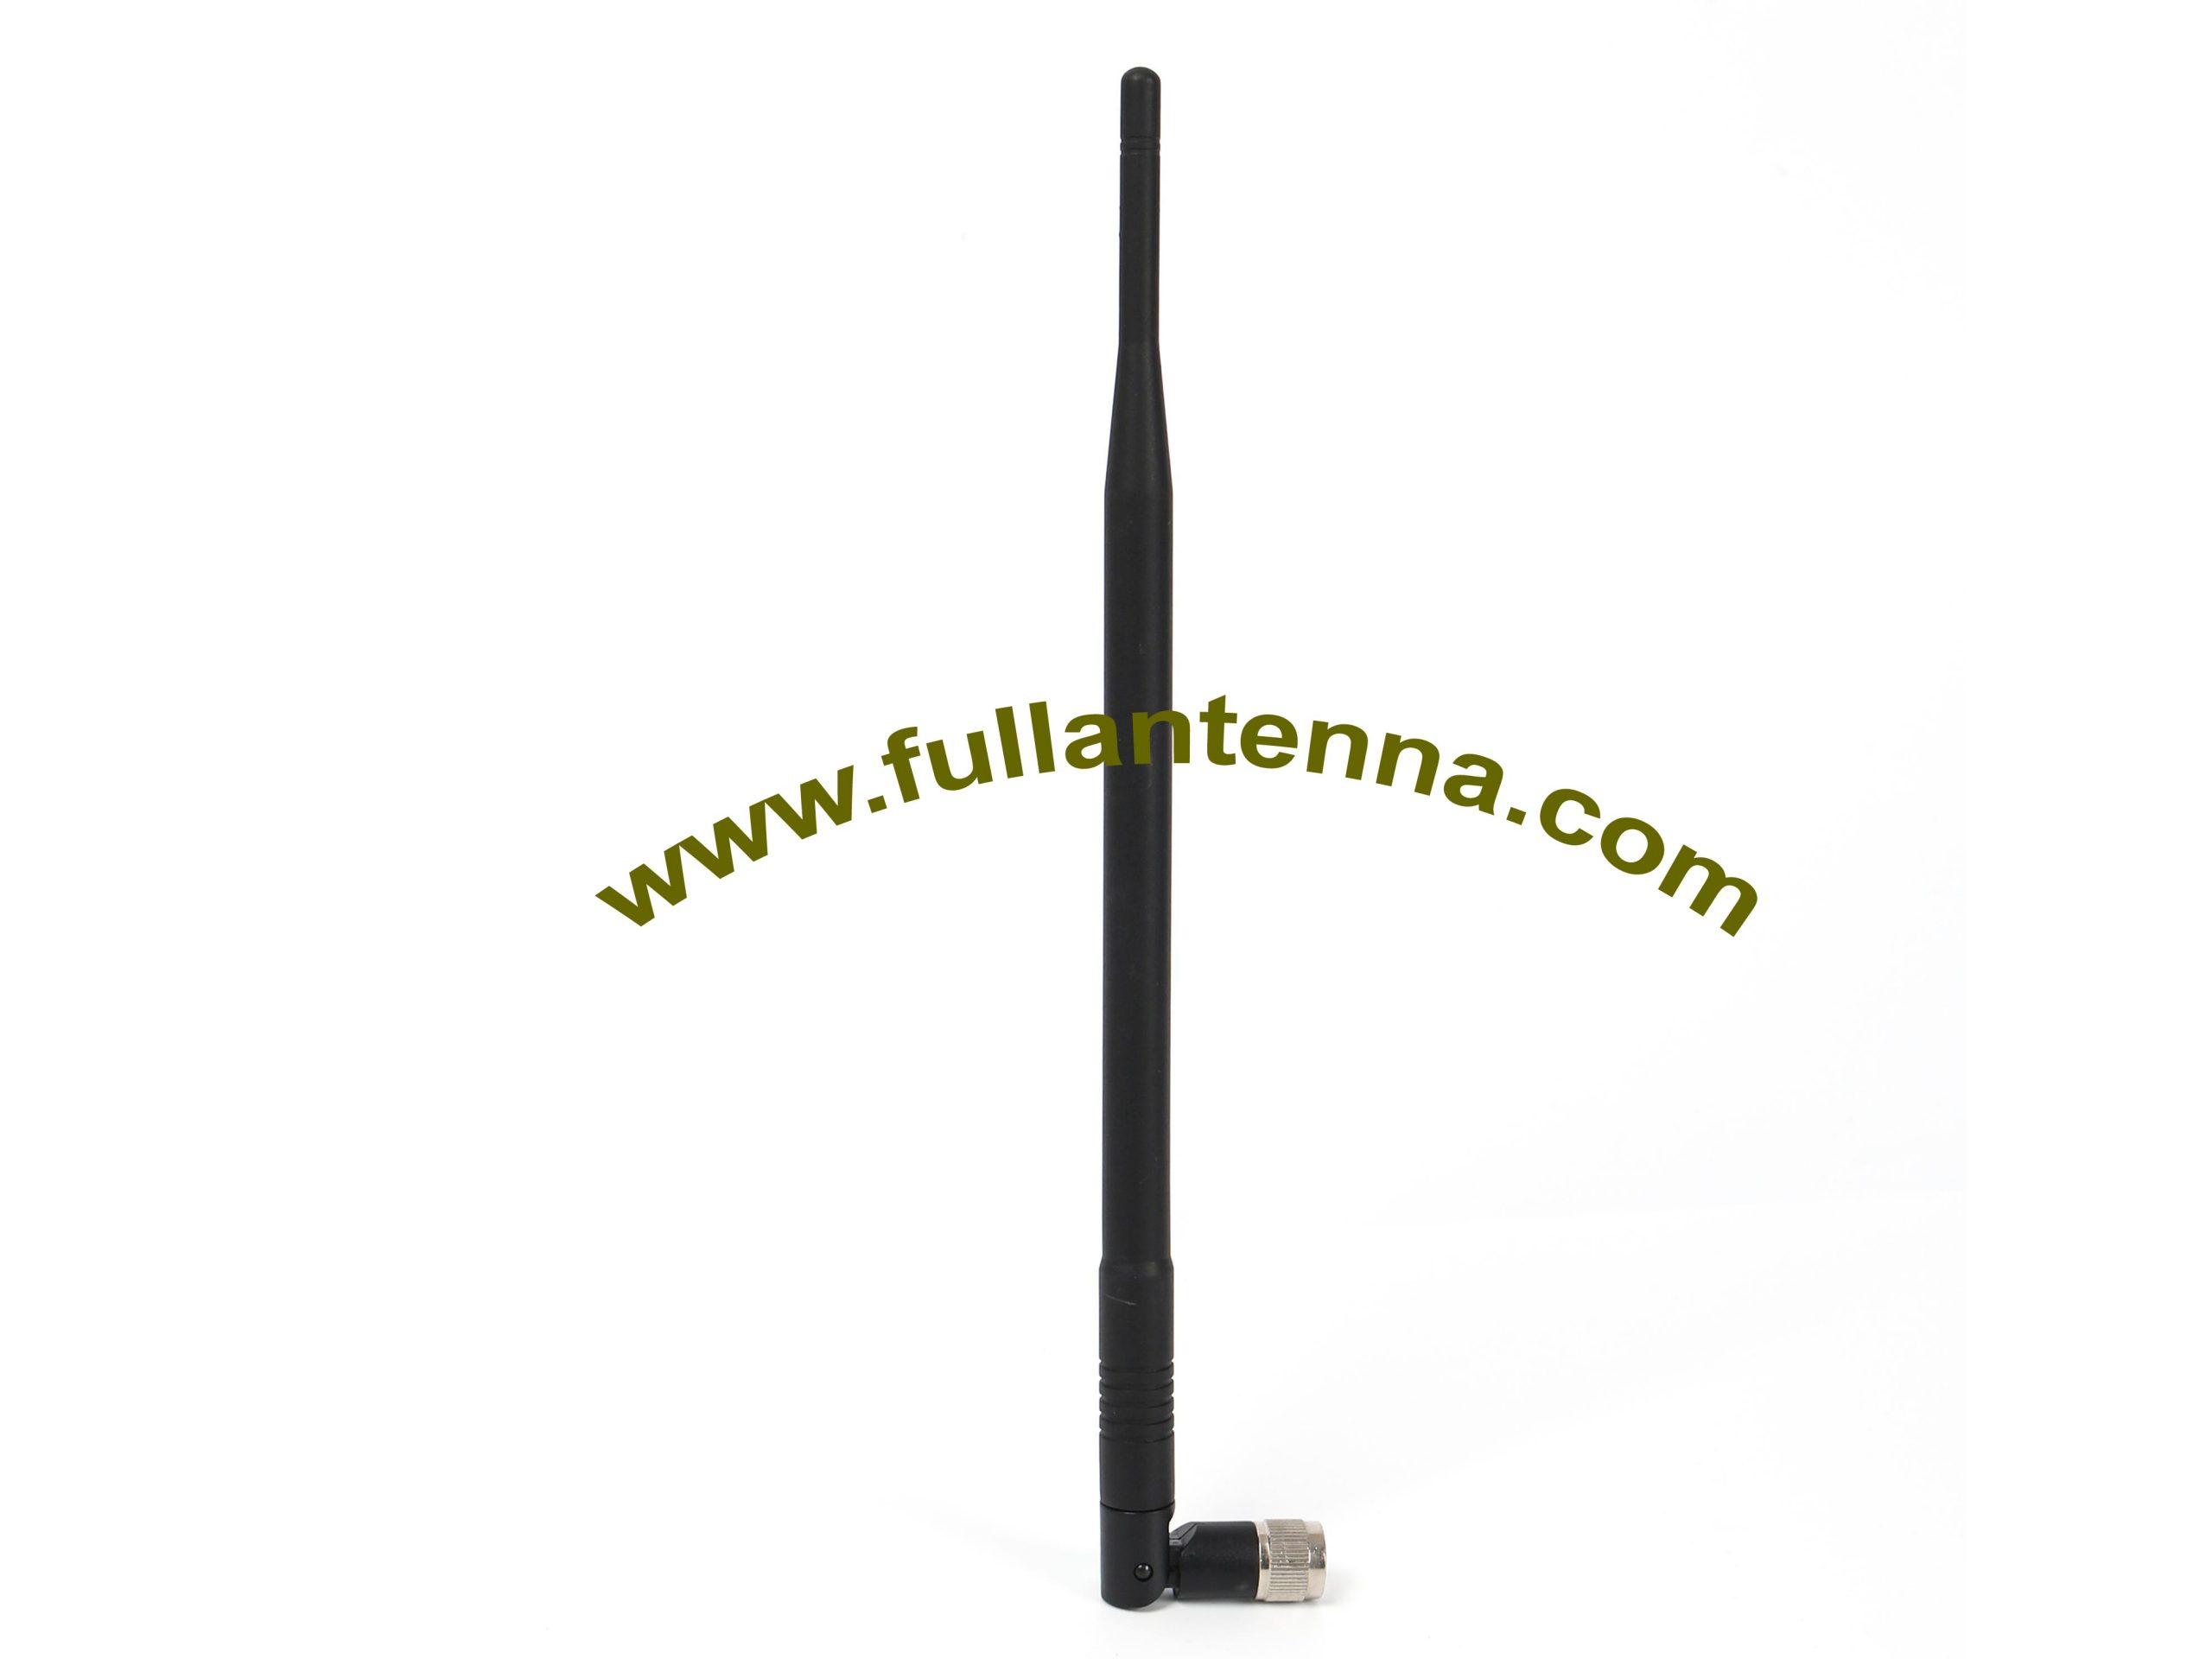 P/N:FA2400.0508,WiFi/2.4G Rubber Antenna,8dbi gain SMA male